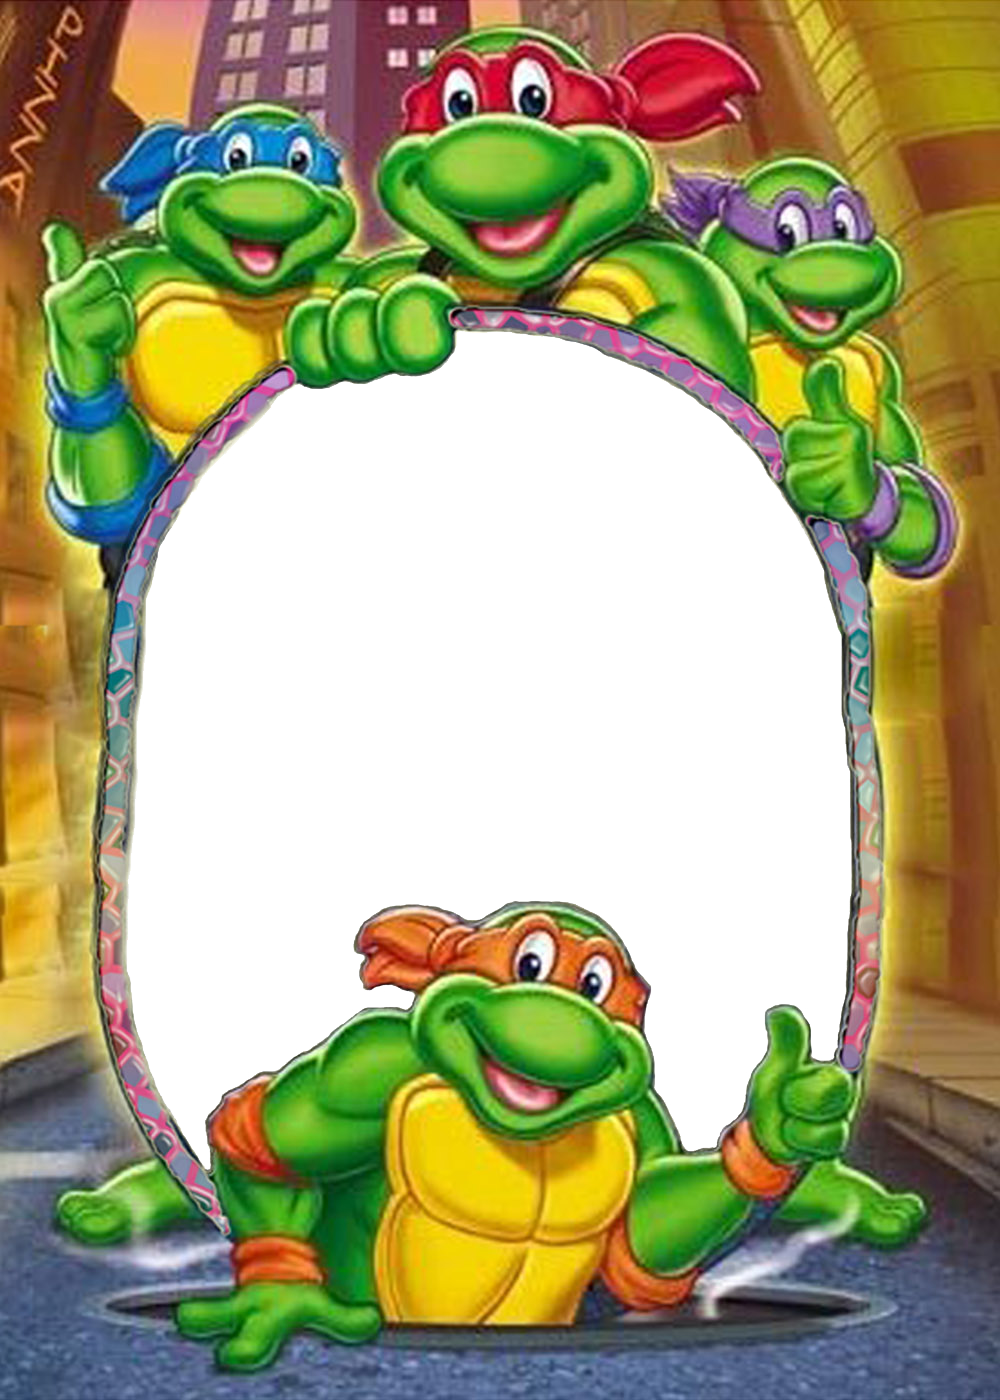 Tartarughe ninja cerca con. Clipart turtle frame